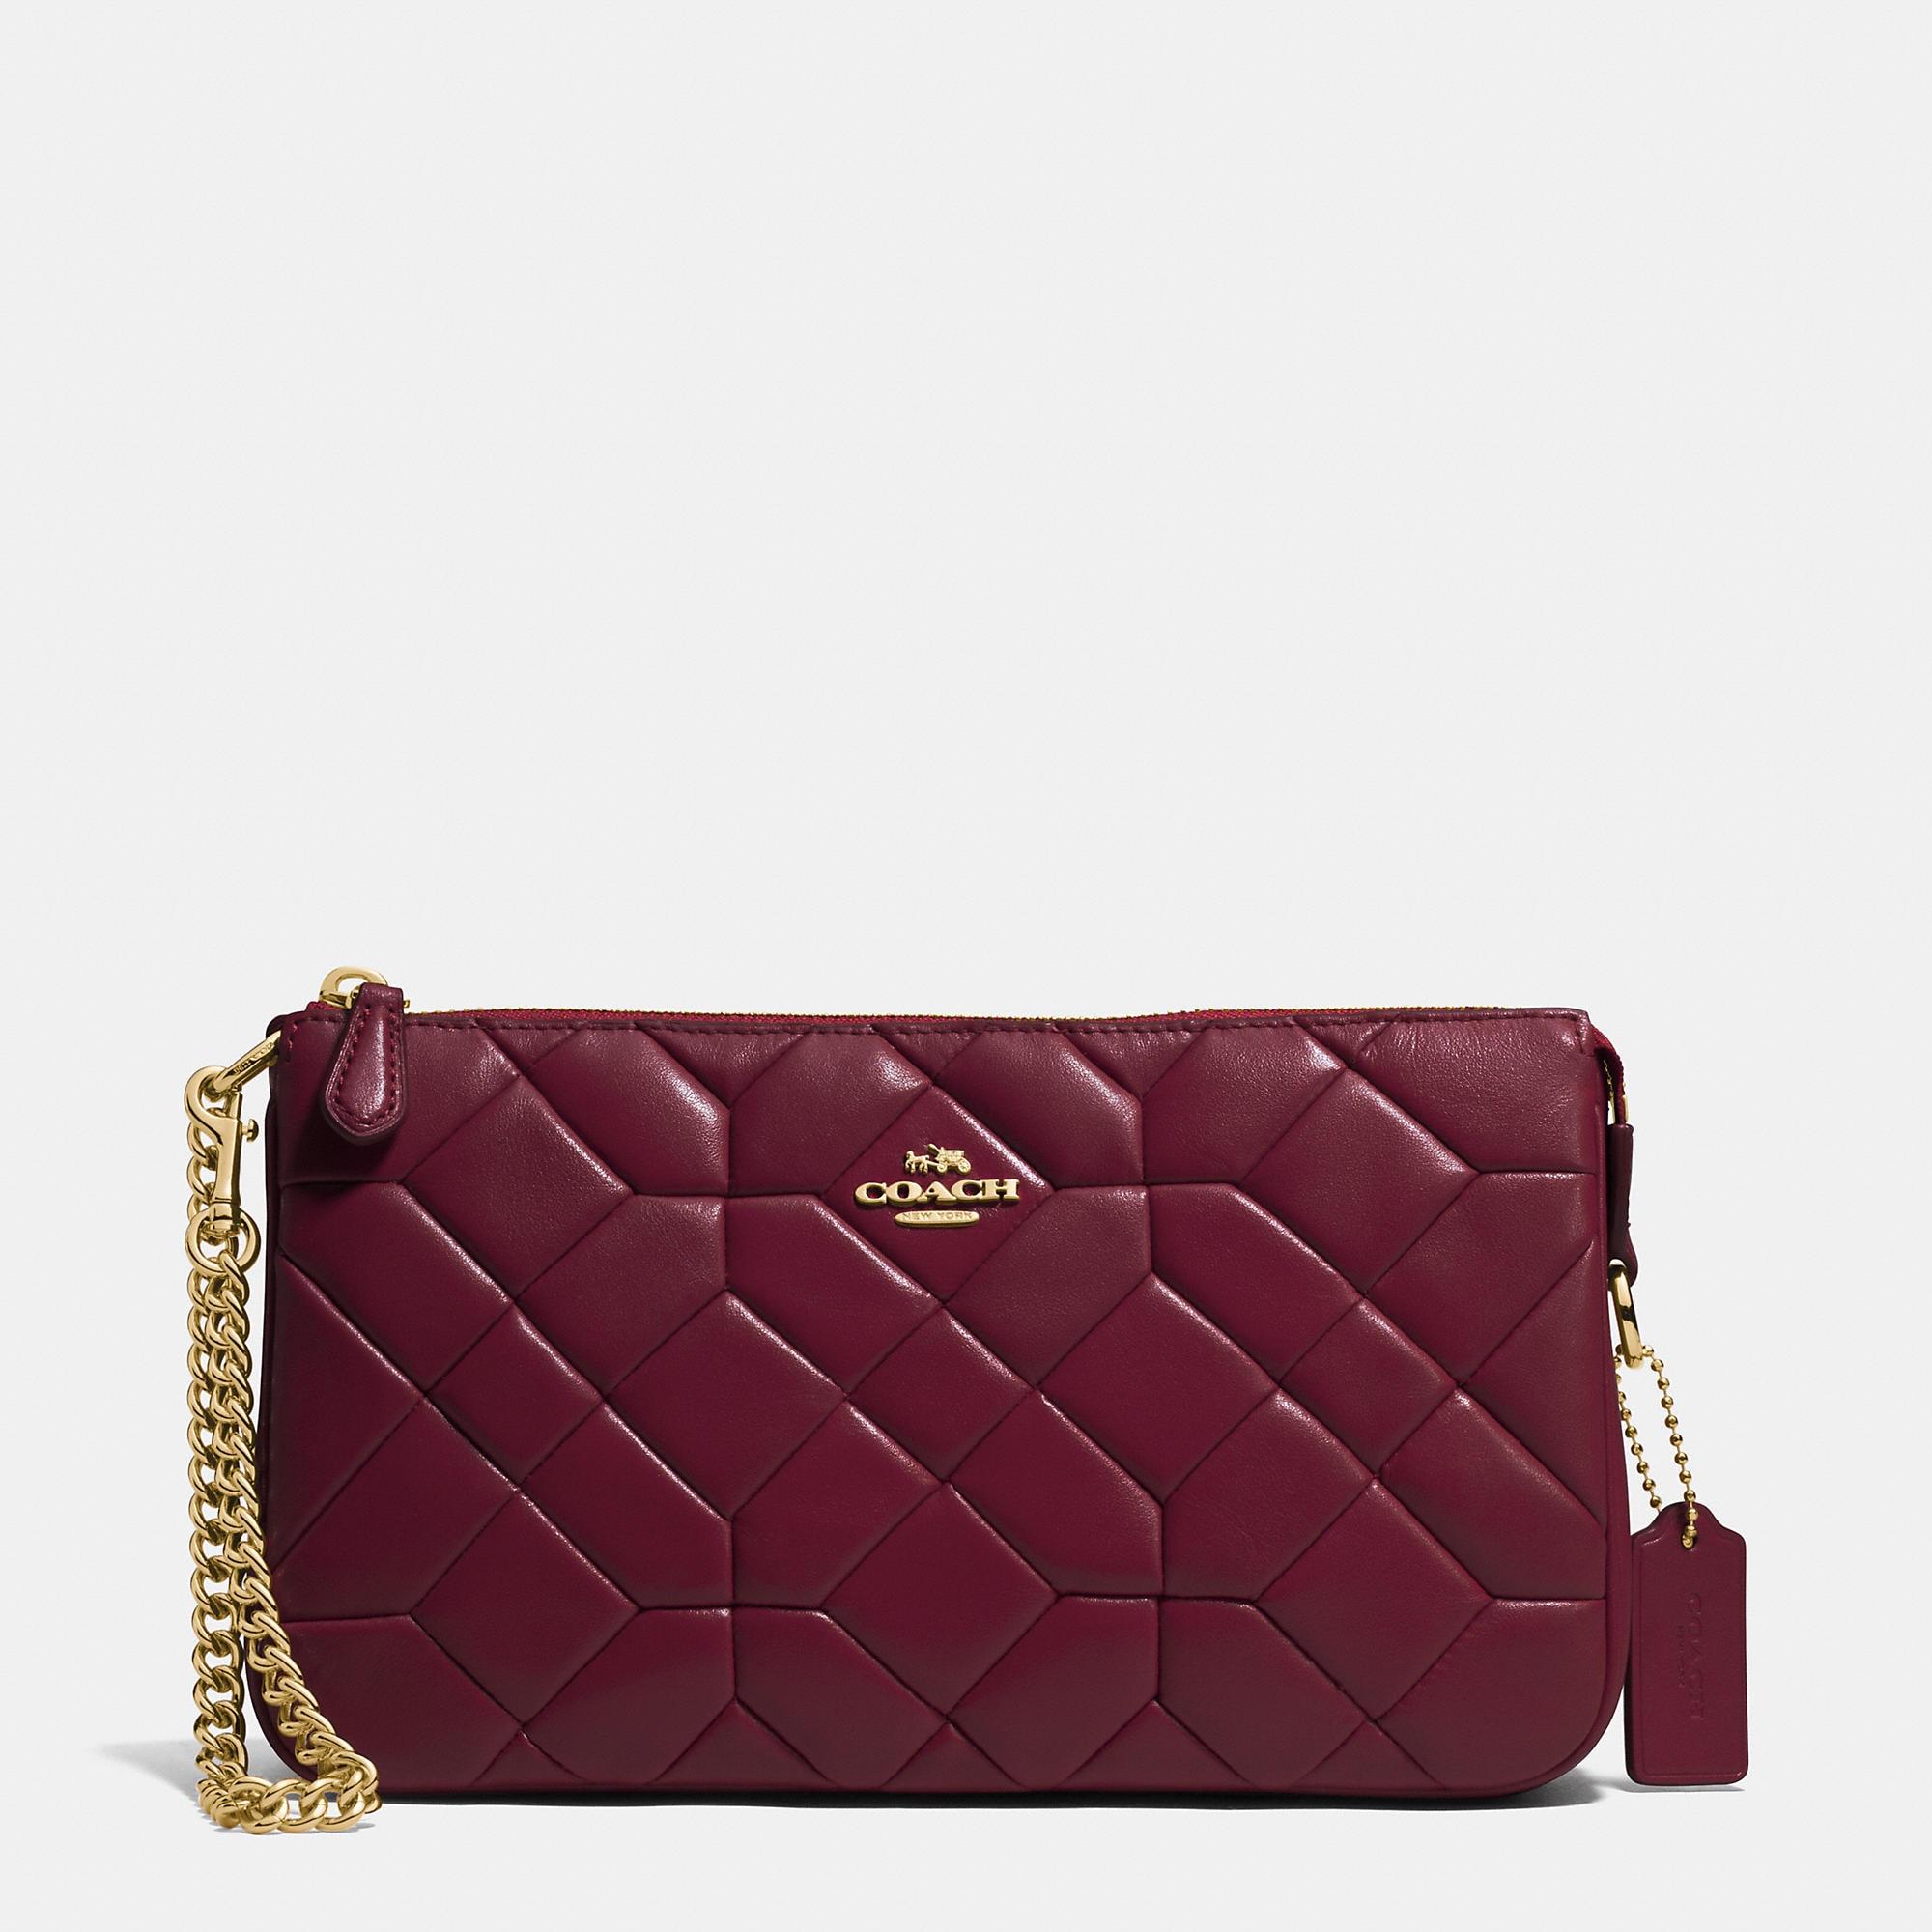 Coach Canyon Quilt Nolita Wristlet 24 In Calf Leather